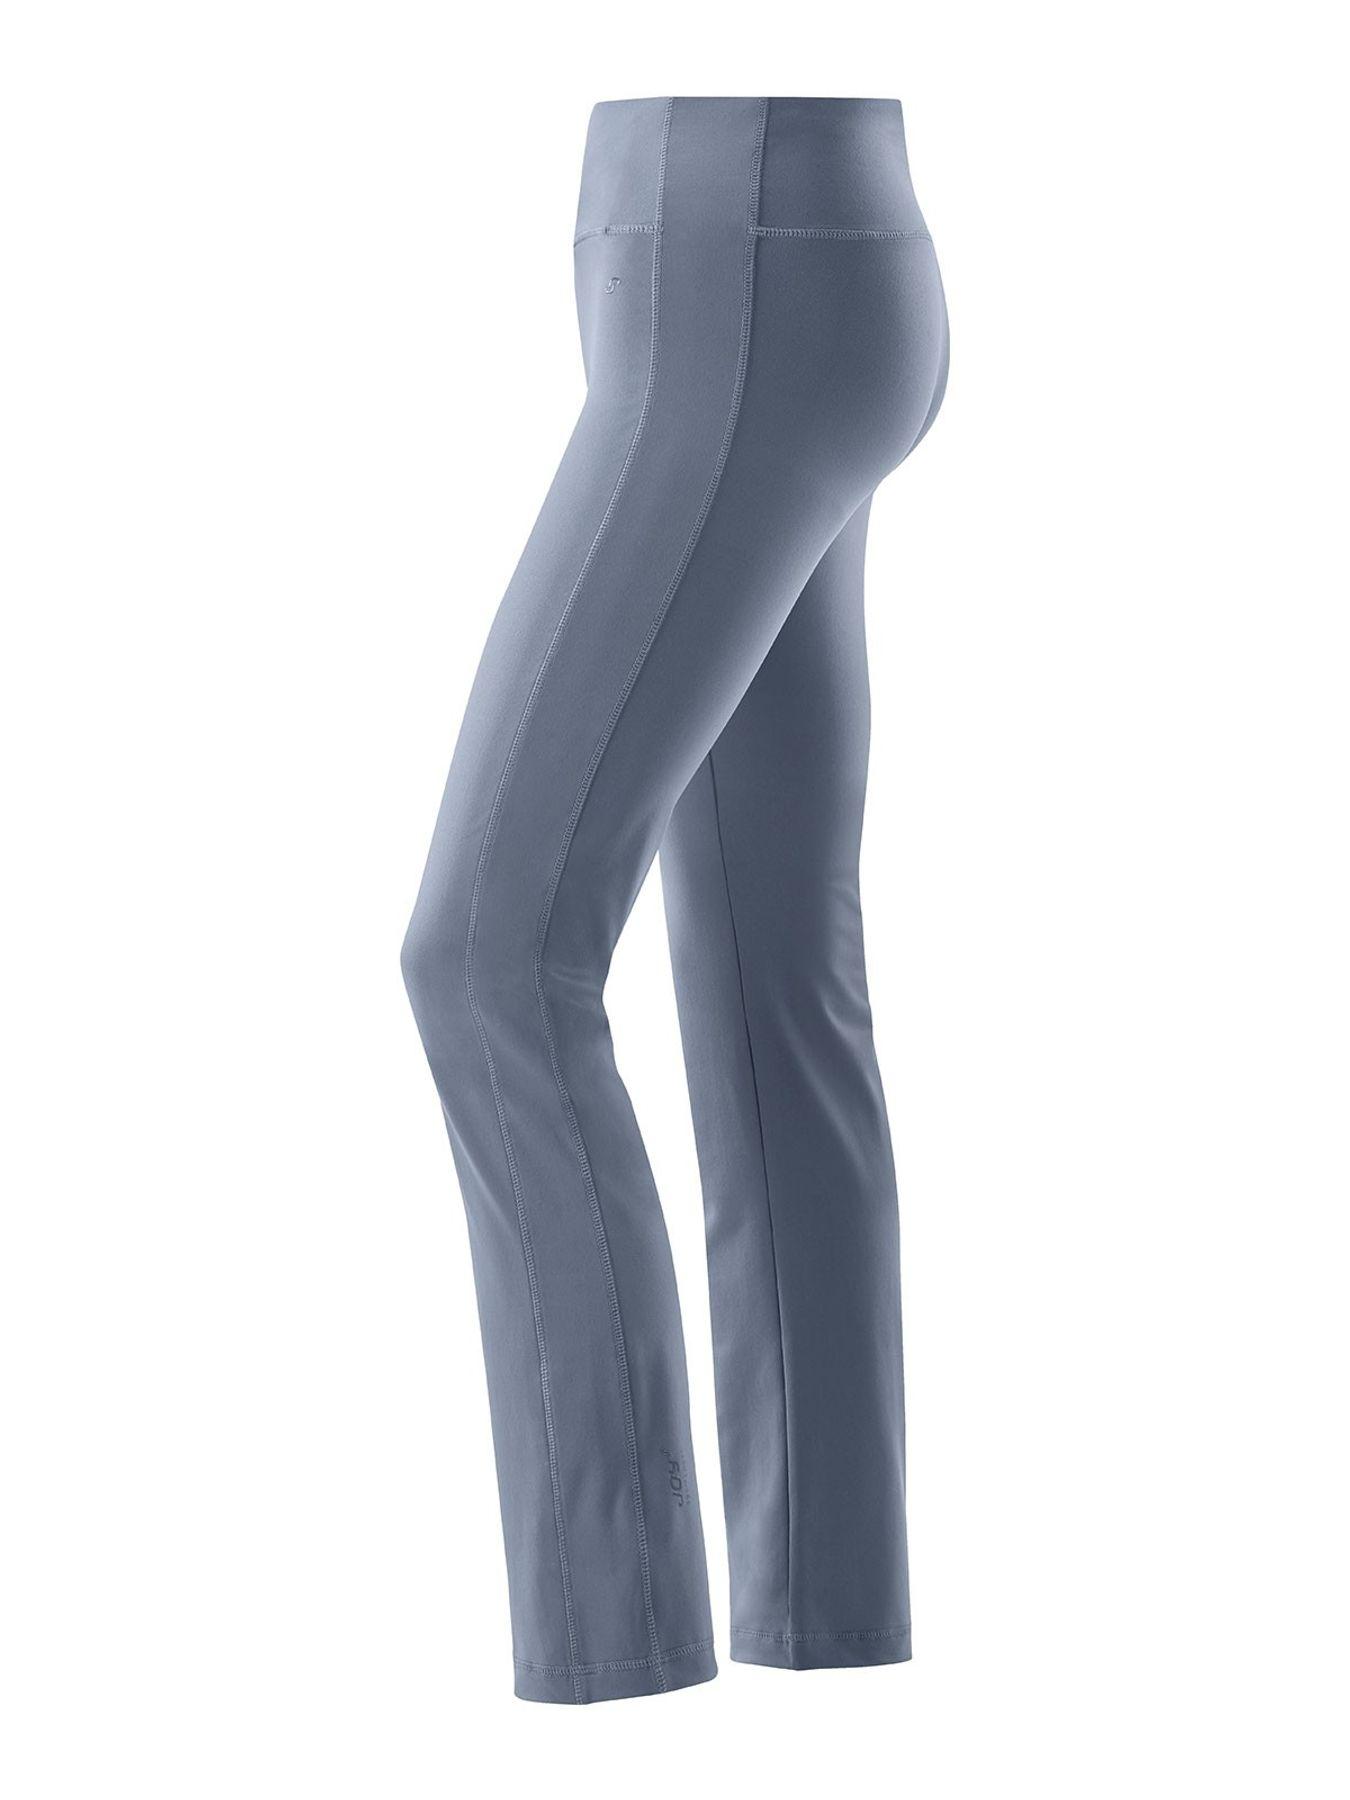 Joy - Bodyfit - Damen Sport Hose in verschiedenen Farben, Ester (30140) – Bild 7